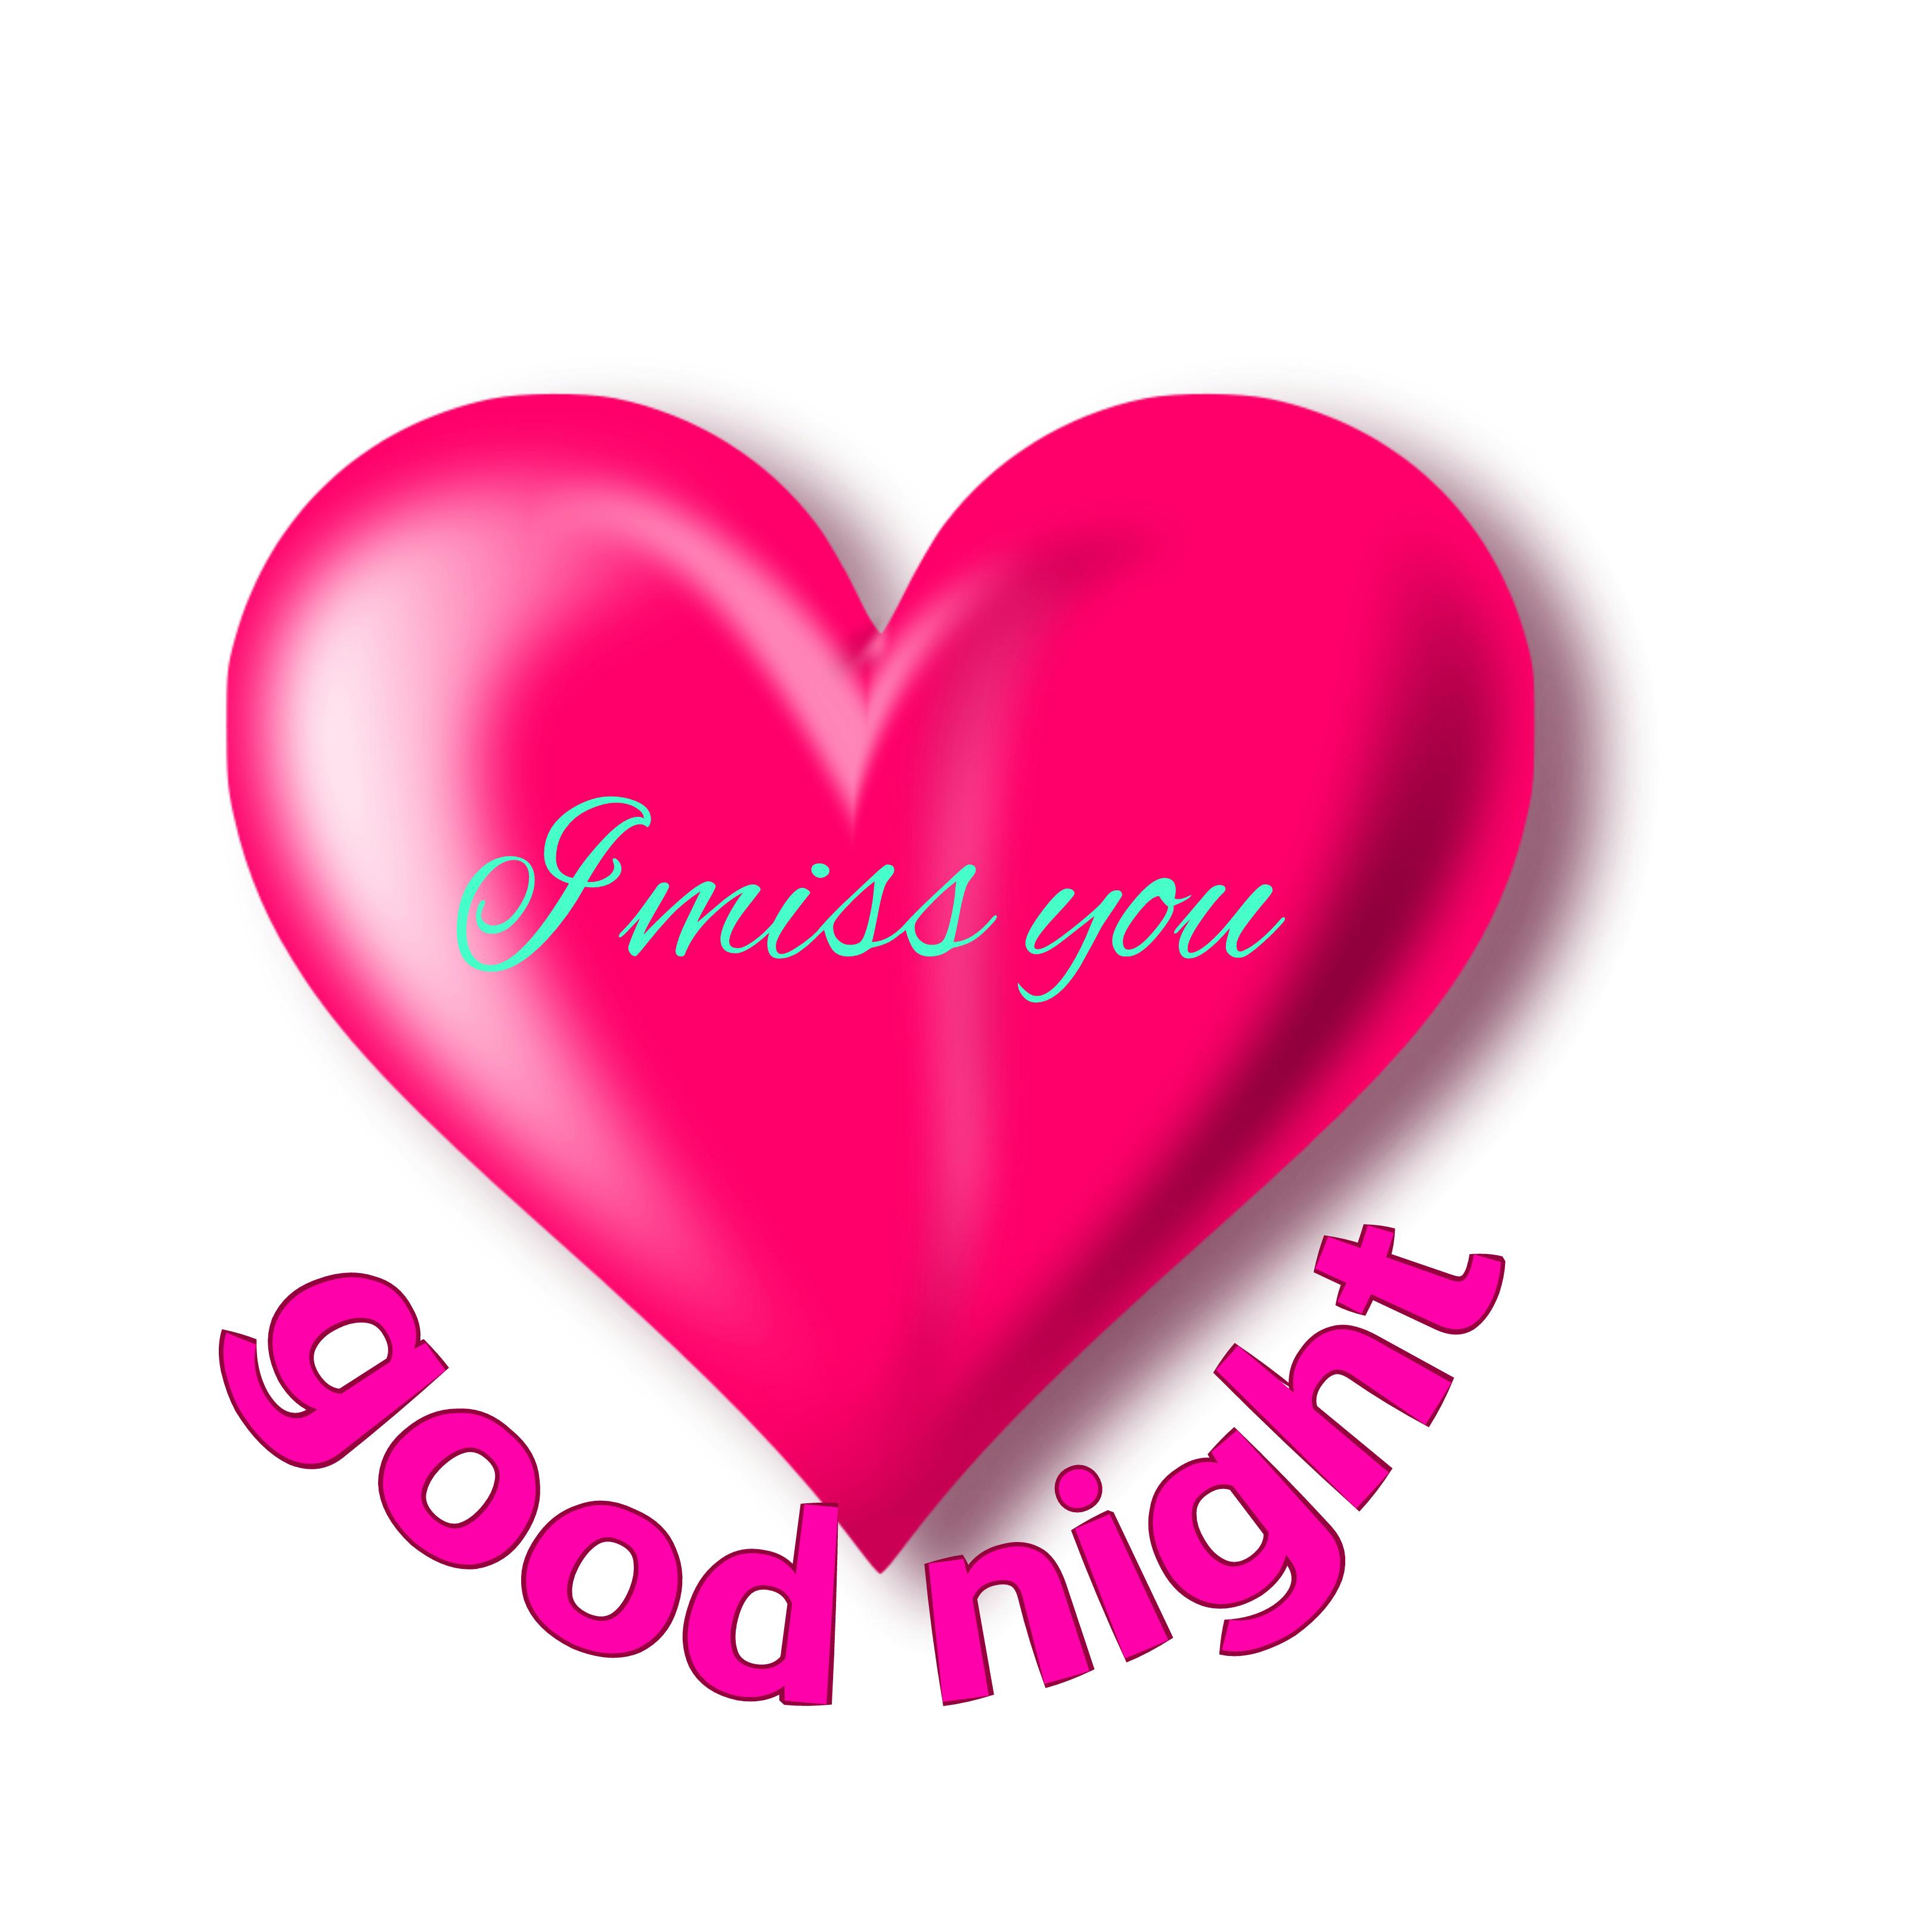 11 Good Night I Love You Wallpapers On Wallpapersafari